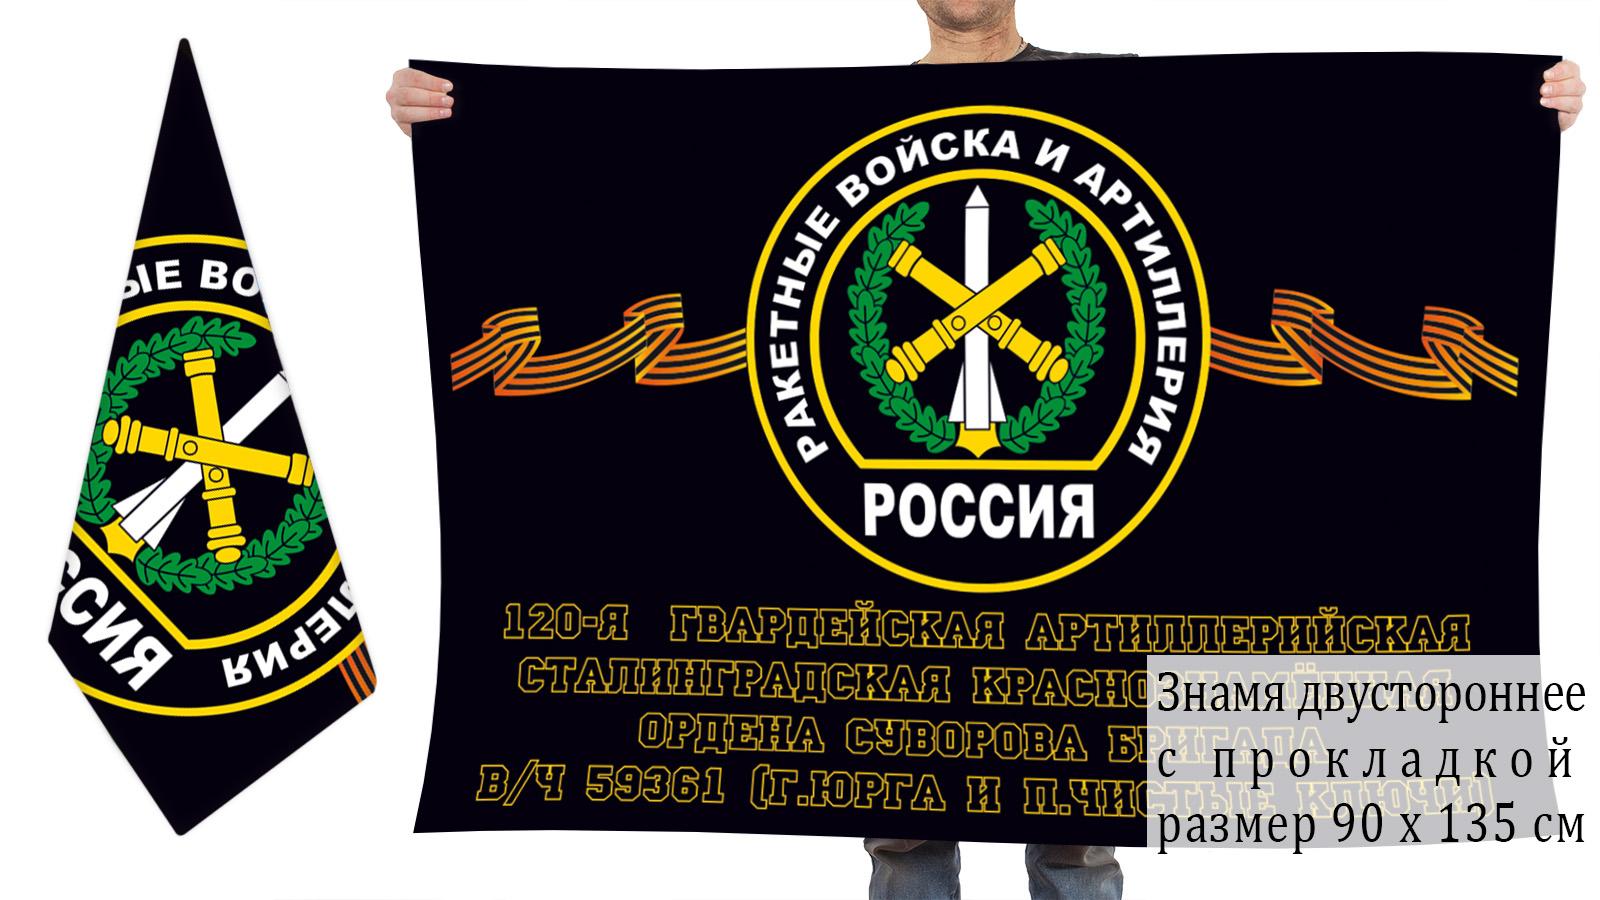 Двусторонний флаг 120 Сталинградской гвардейской артиллерийской бригады